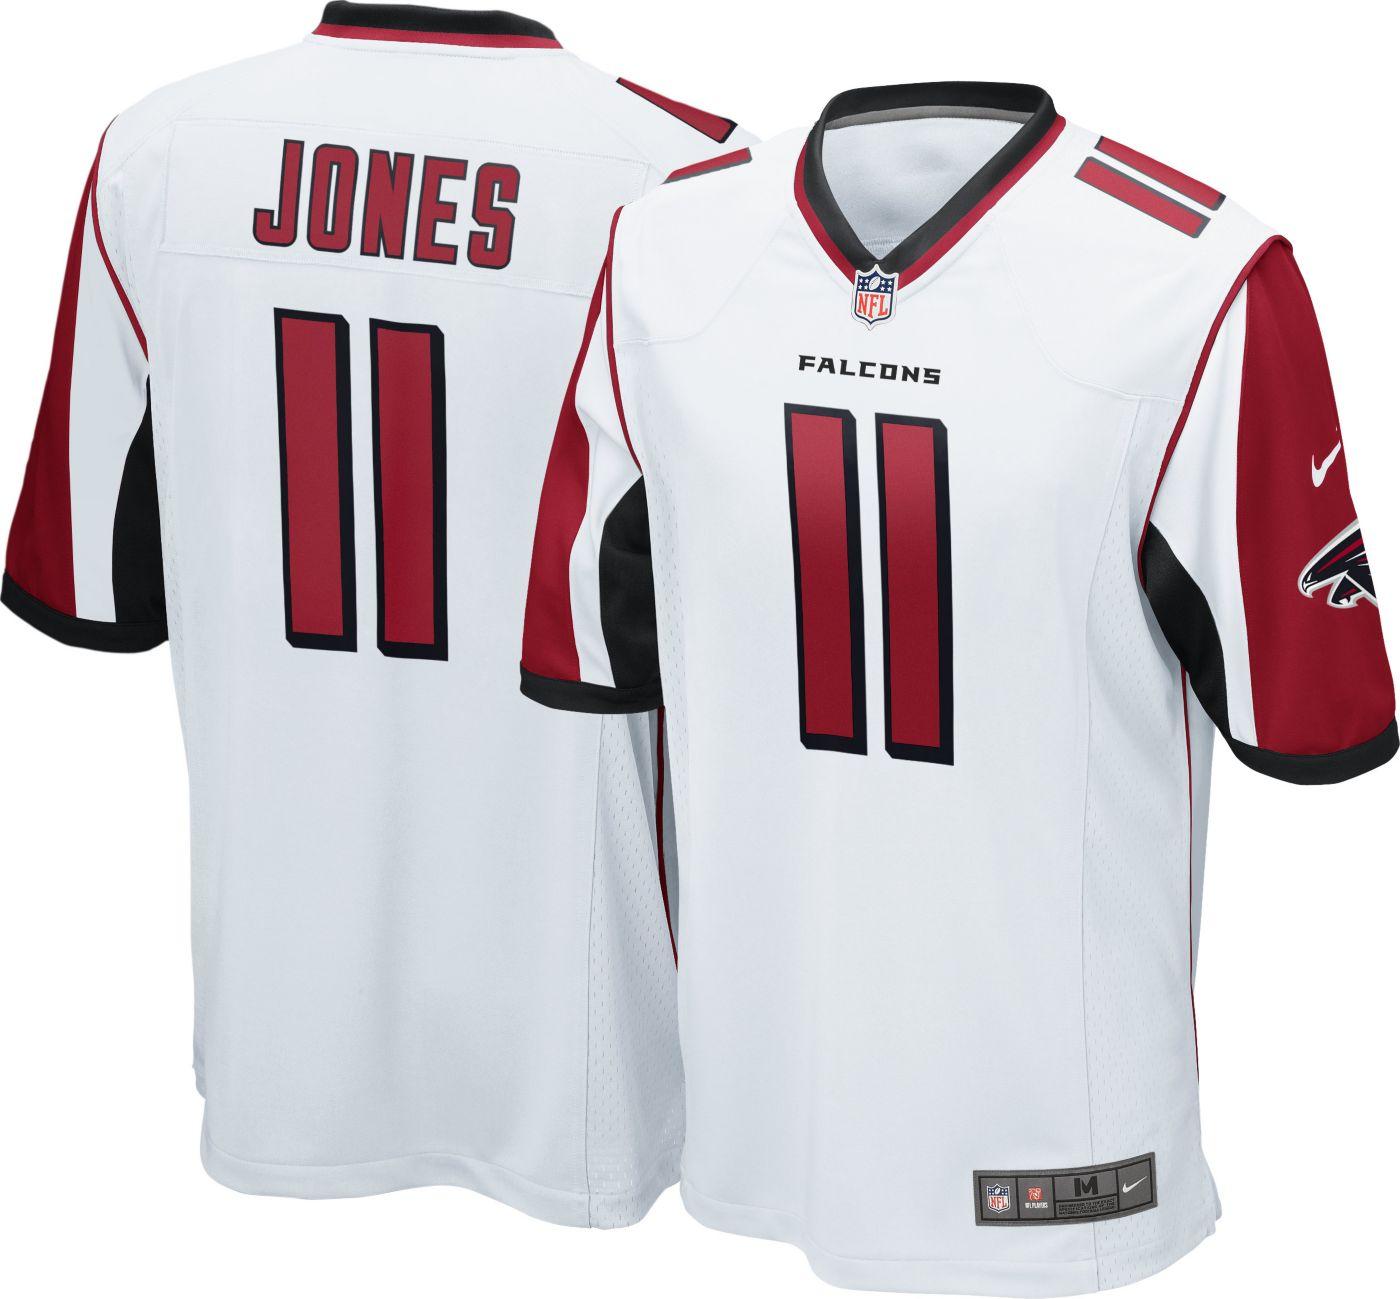 Nike Men's Away Game Jersey Atlanta Falcons Julio Jones #11